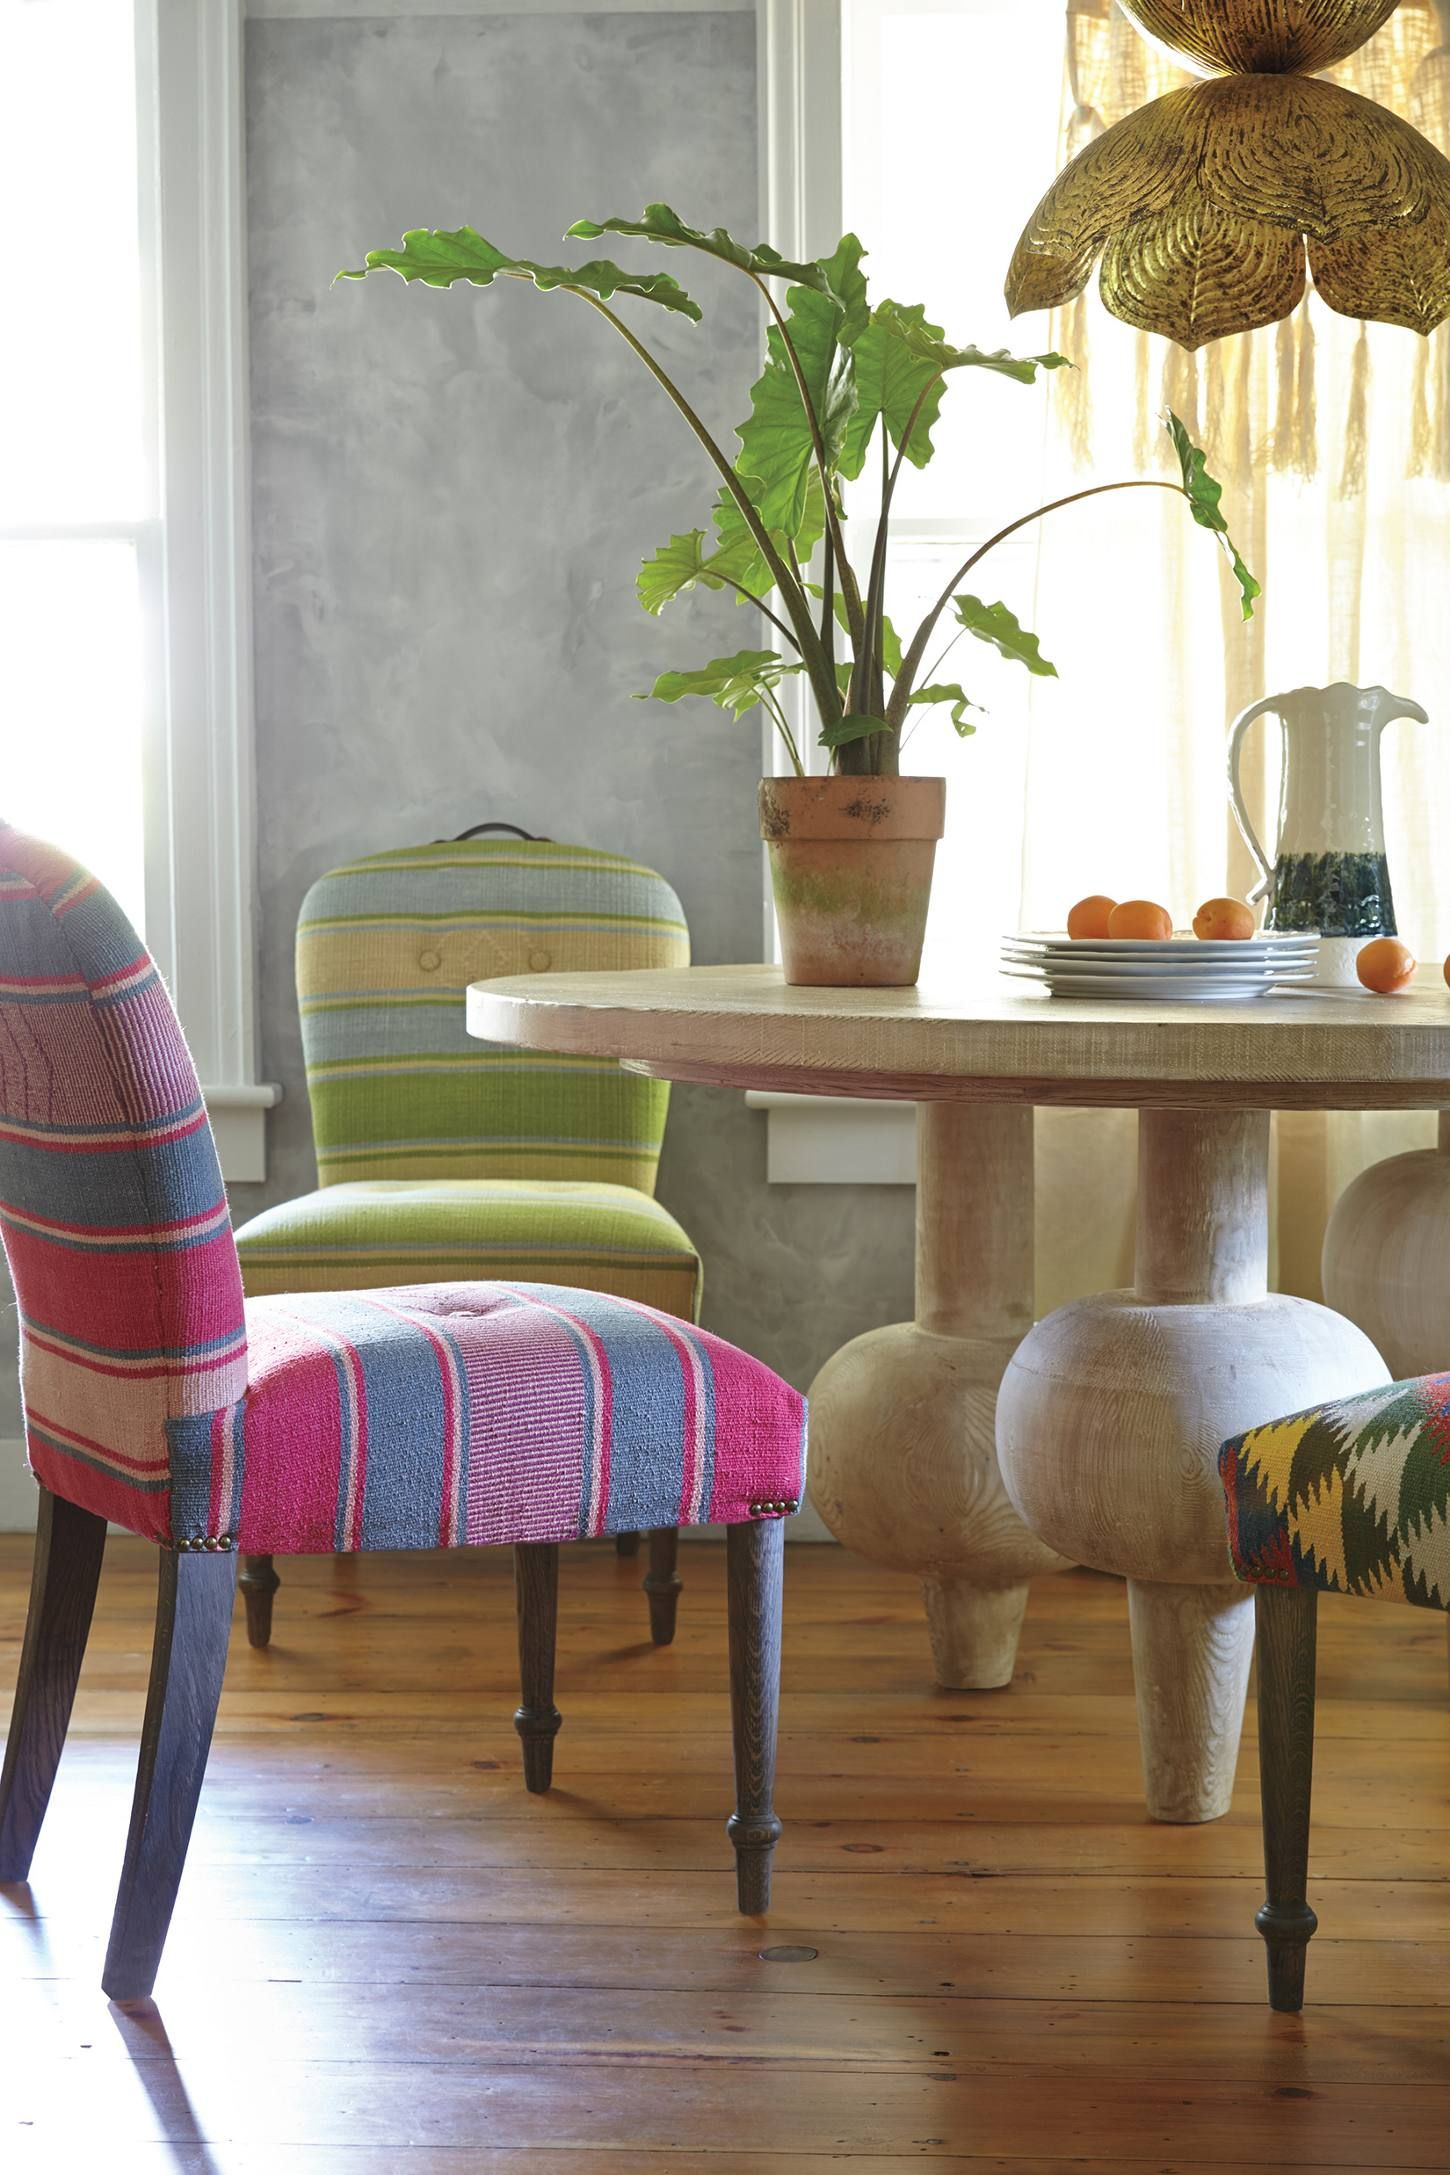 Ordinaire Folkthread Chair Kit Kemp #Anthrofave · Dining Room ...